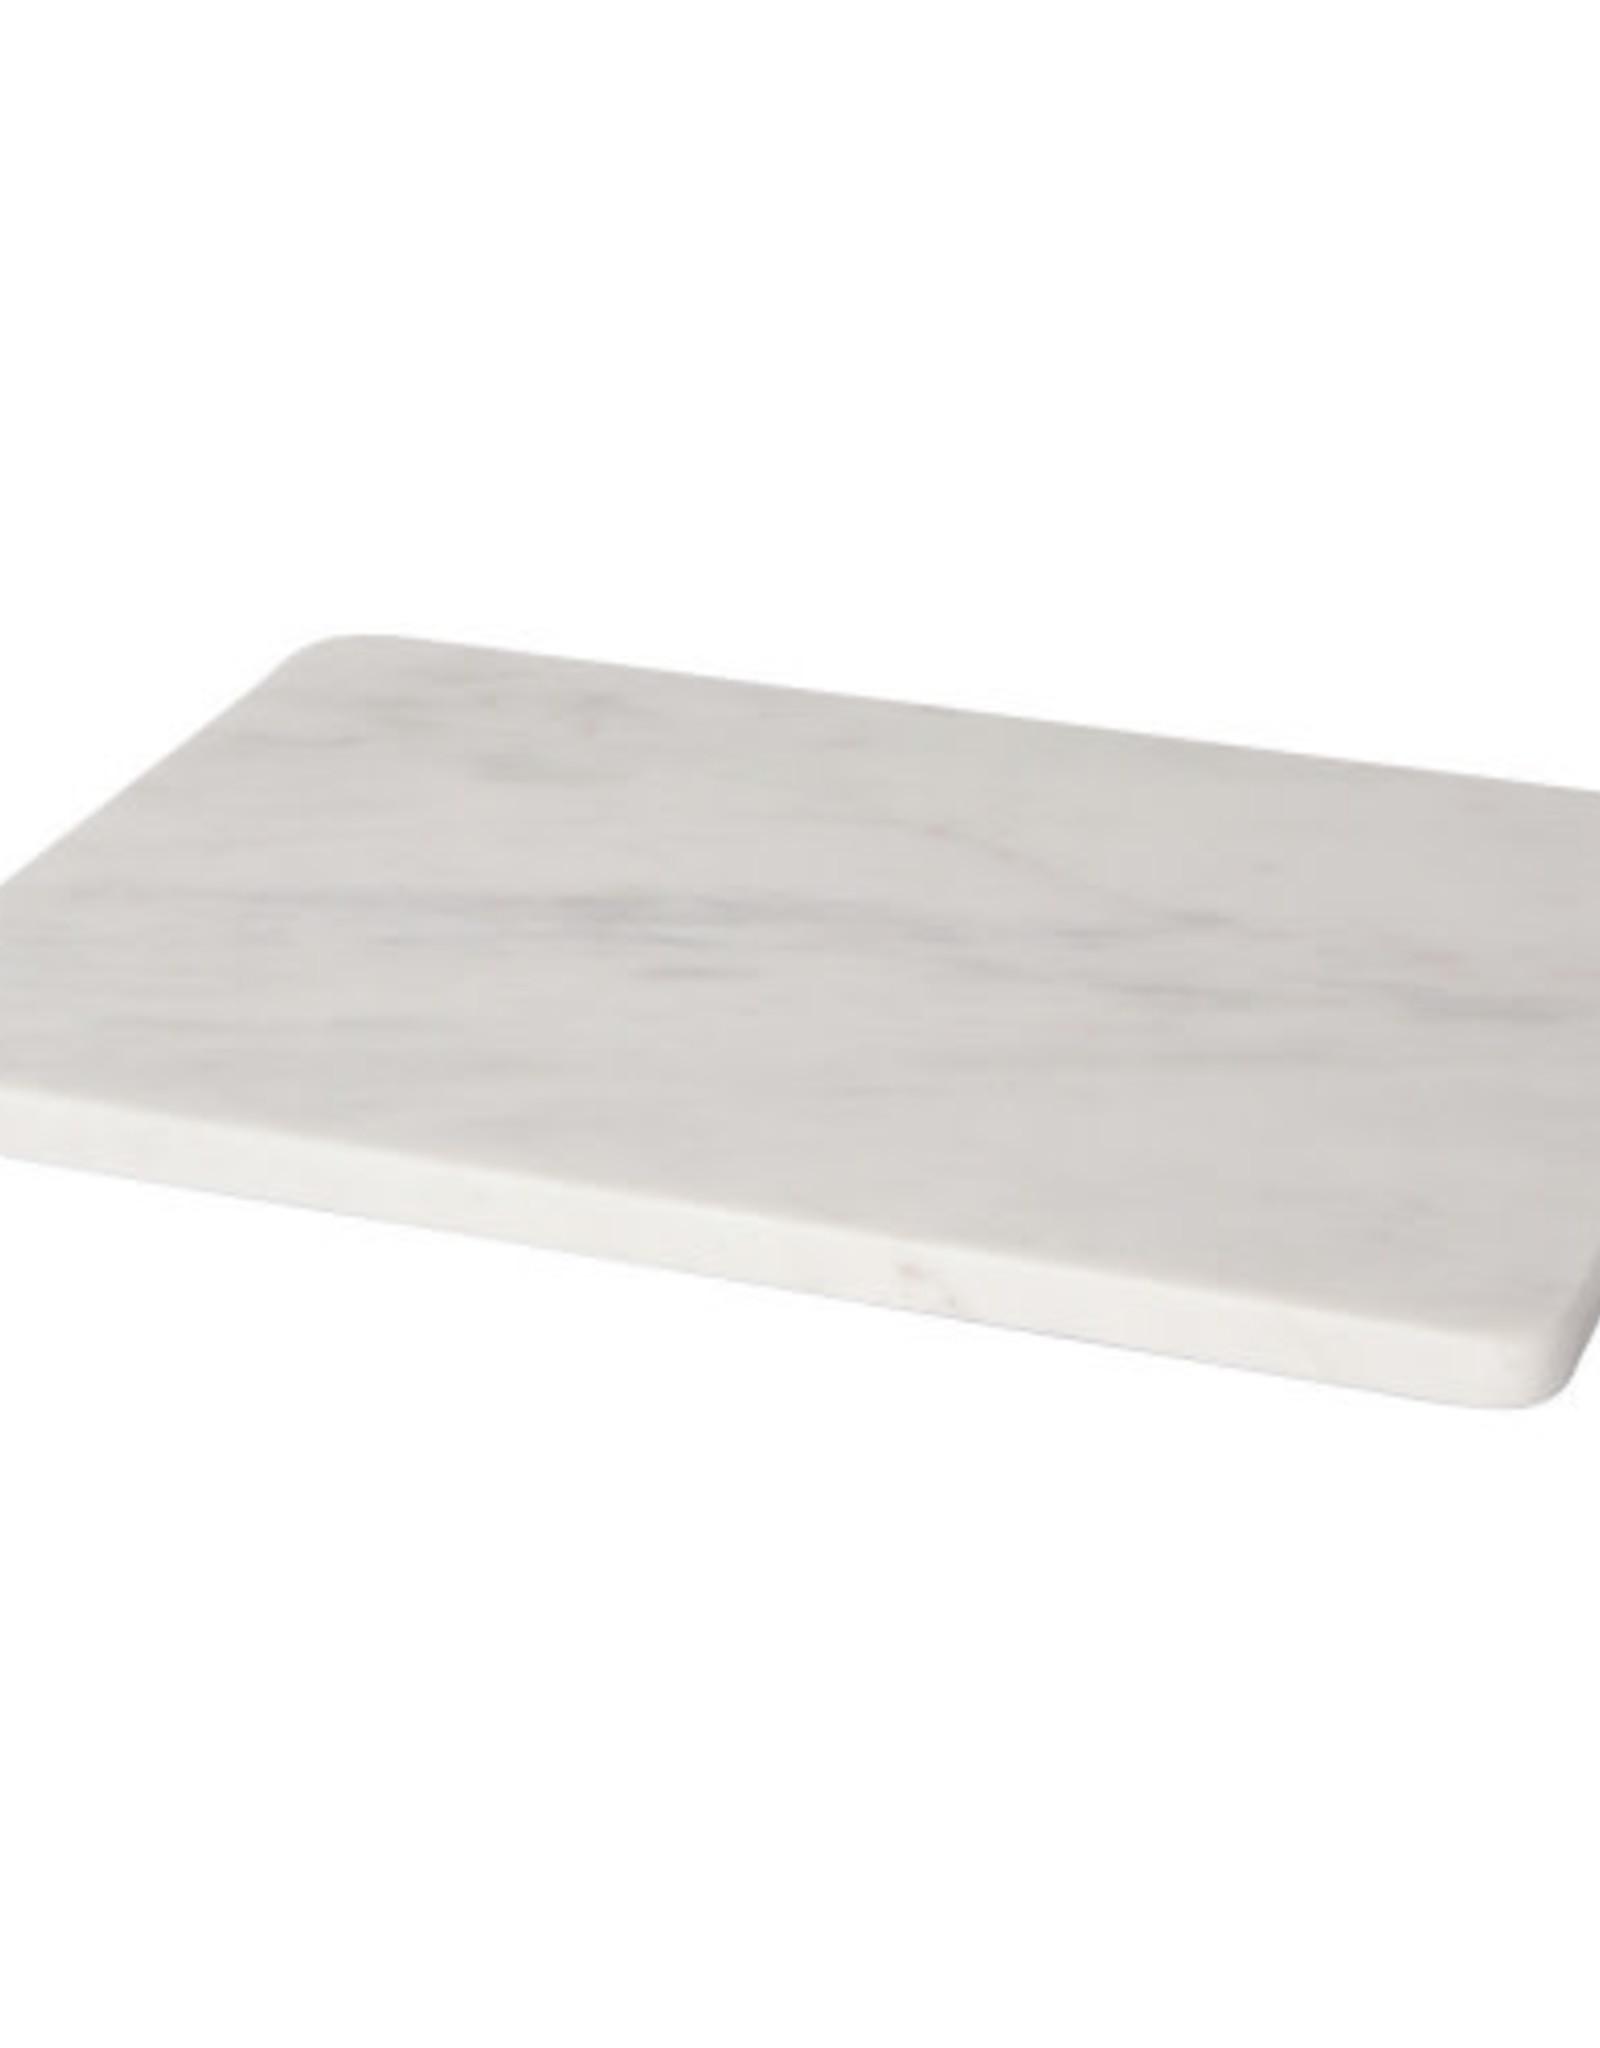 "White Marble Serving Board L14"" W8"""